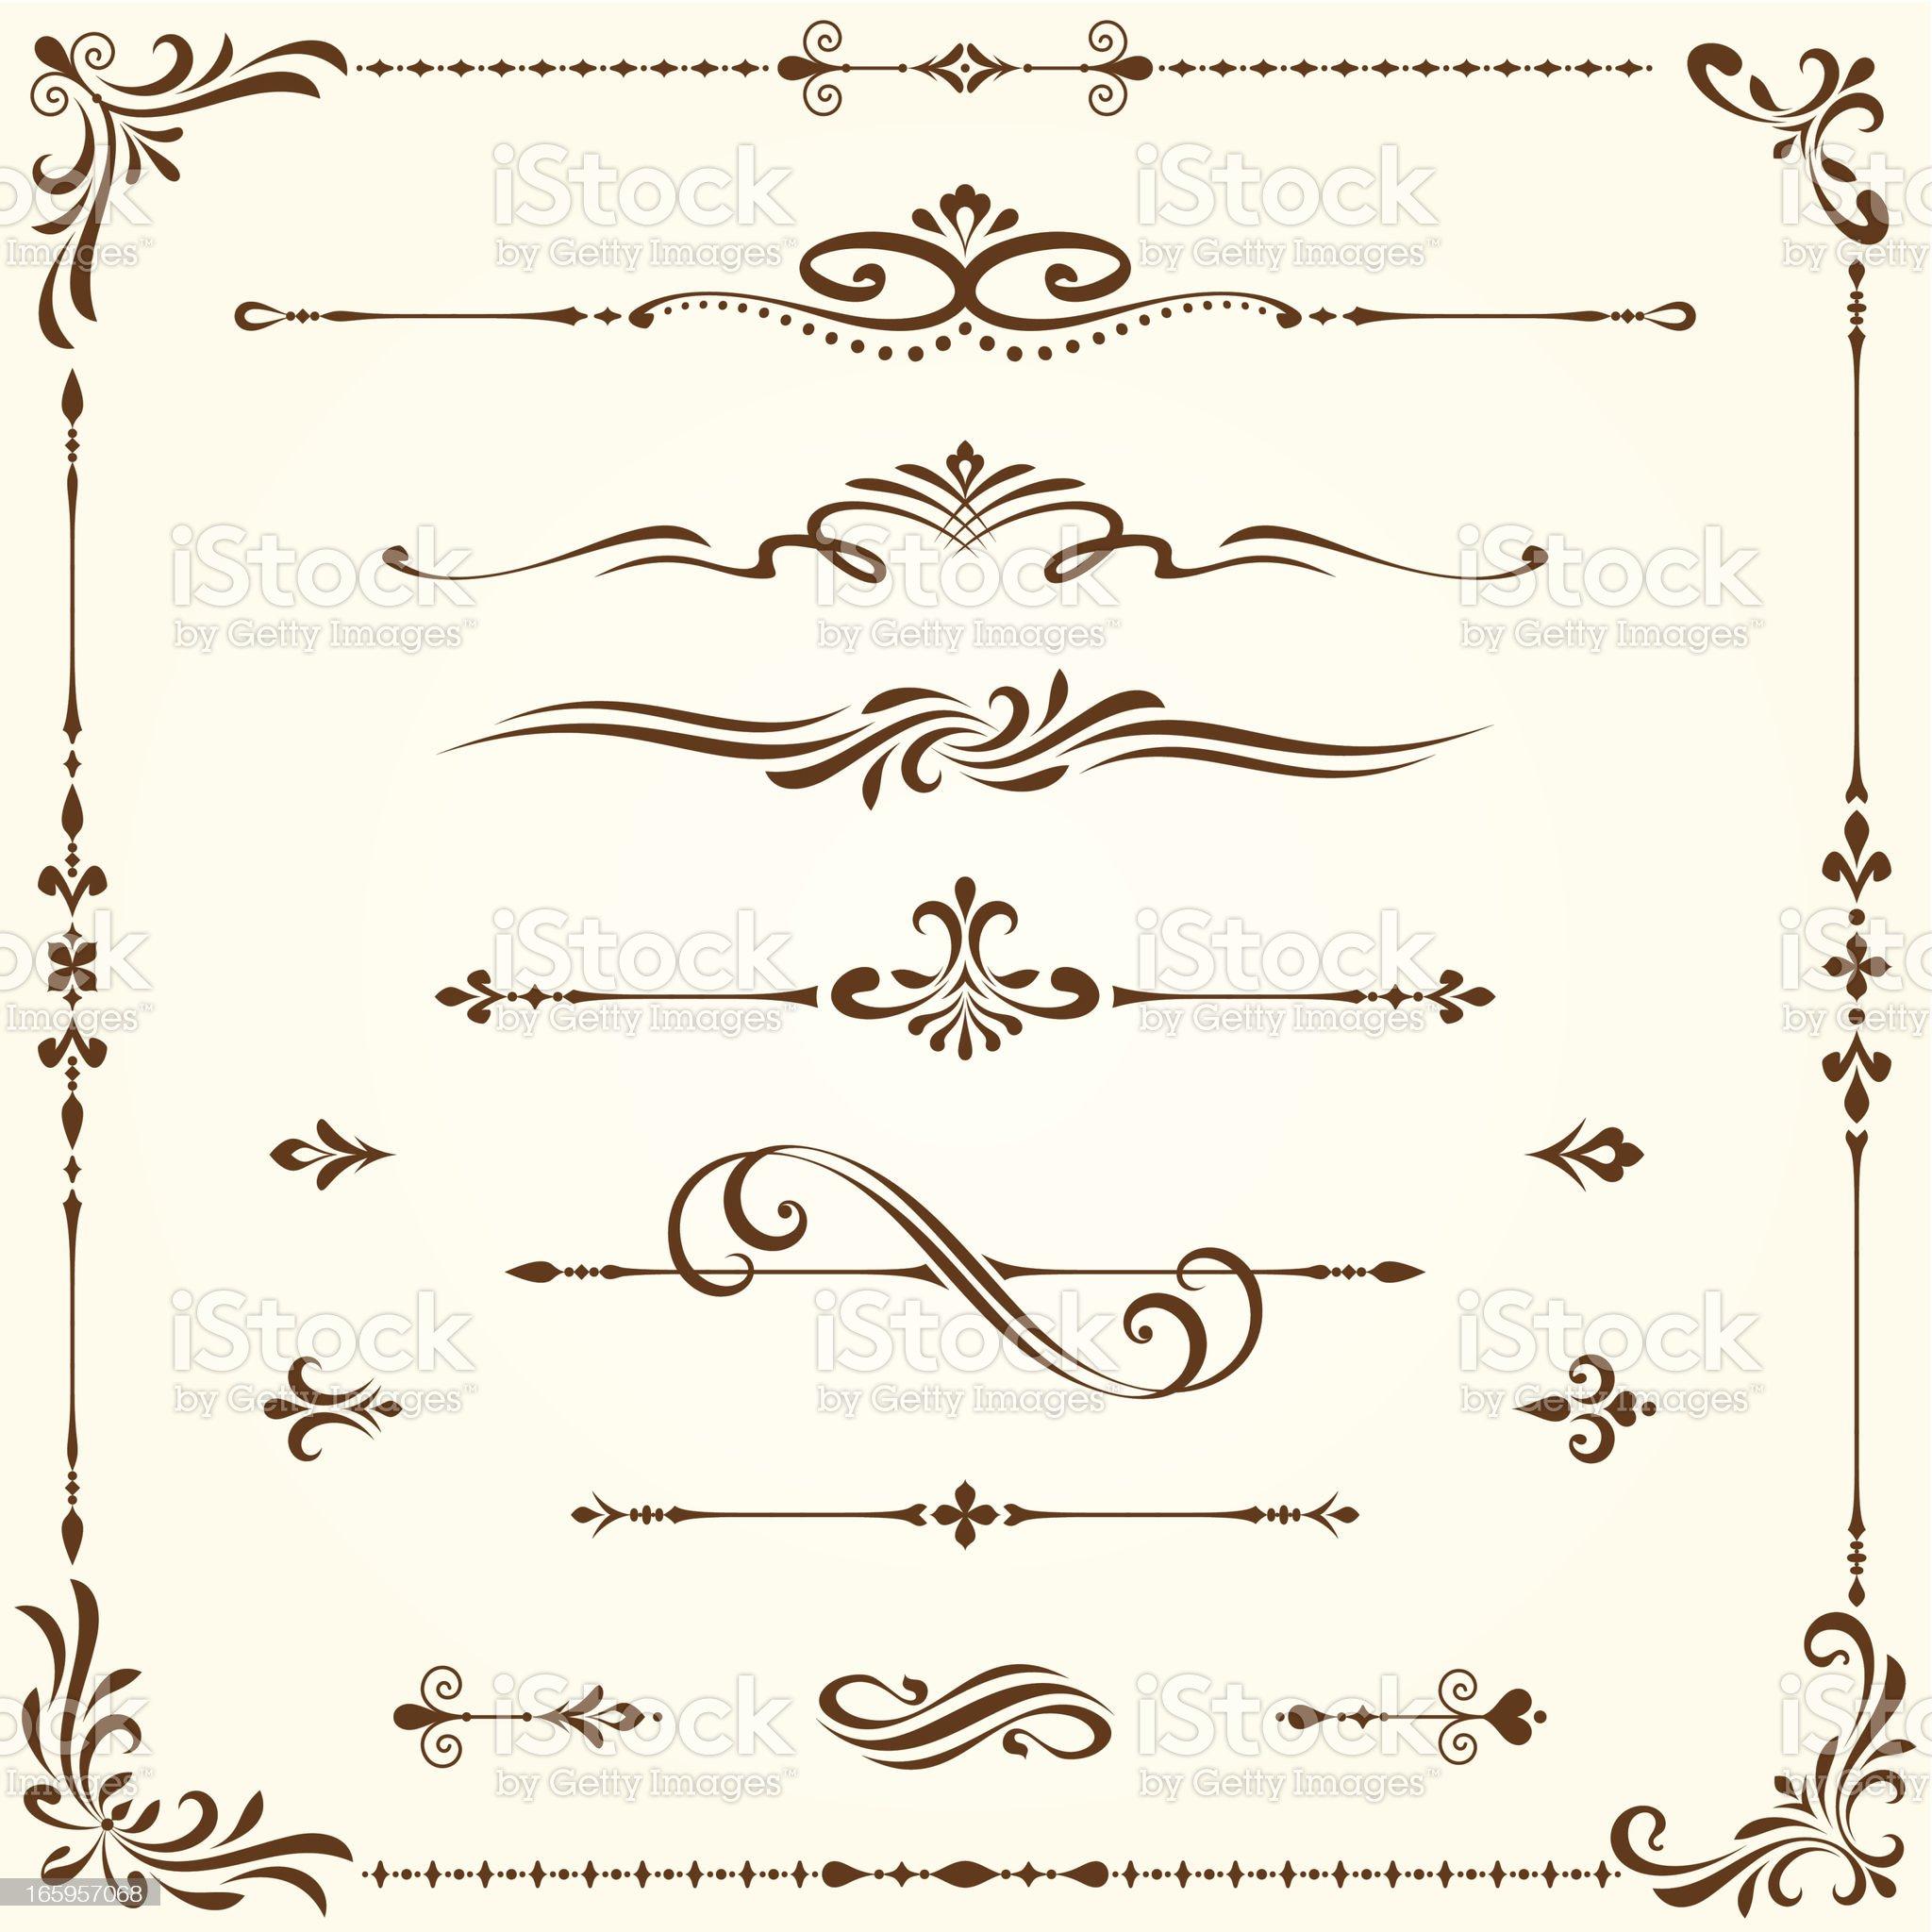 Ornate Elements Set royalty-free stock vector art